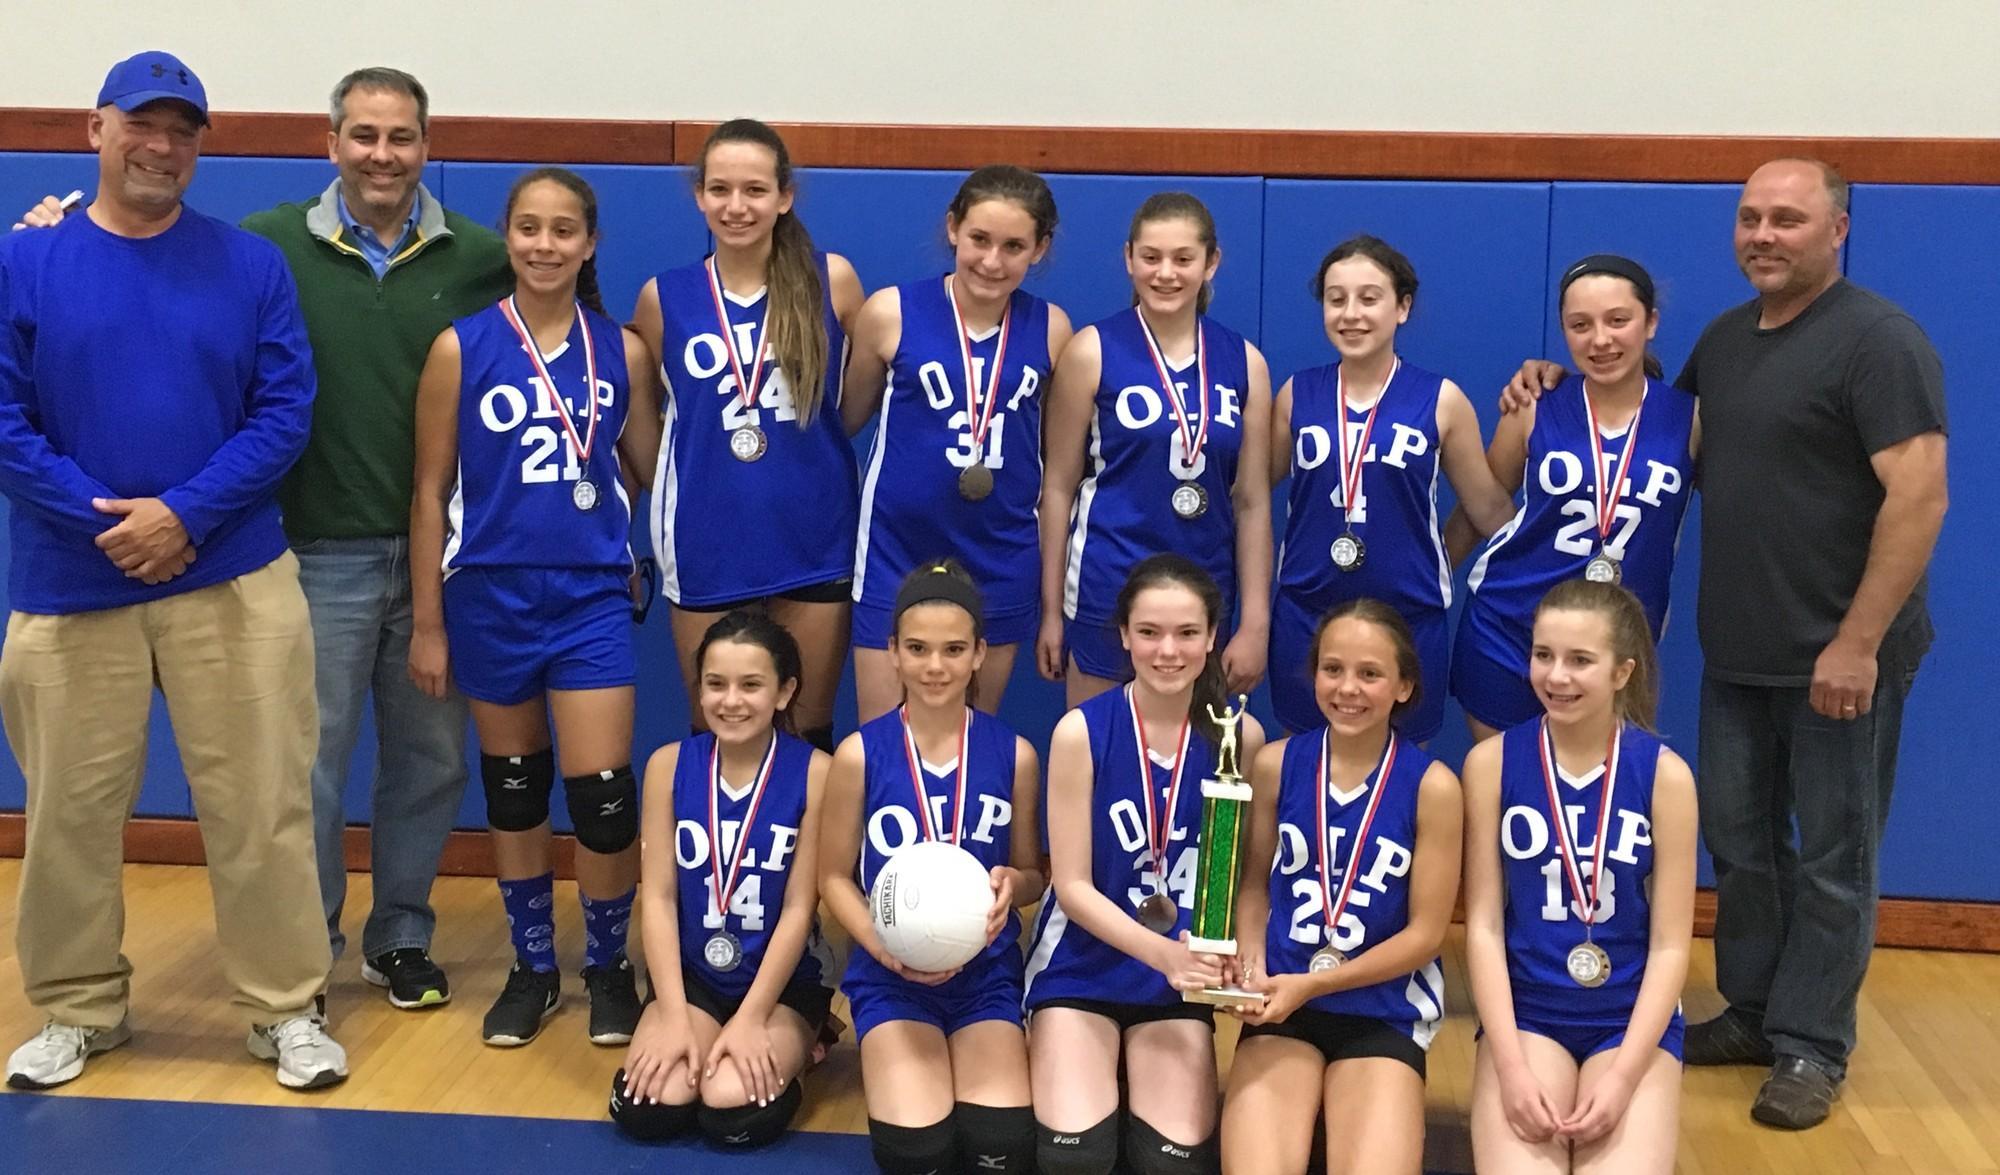 Lynbrook Olp Volleyball Team Wins 2016 Nassau Suffolk Championship Herald Community Newspapers Www Liherald Com